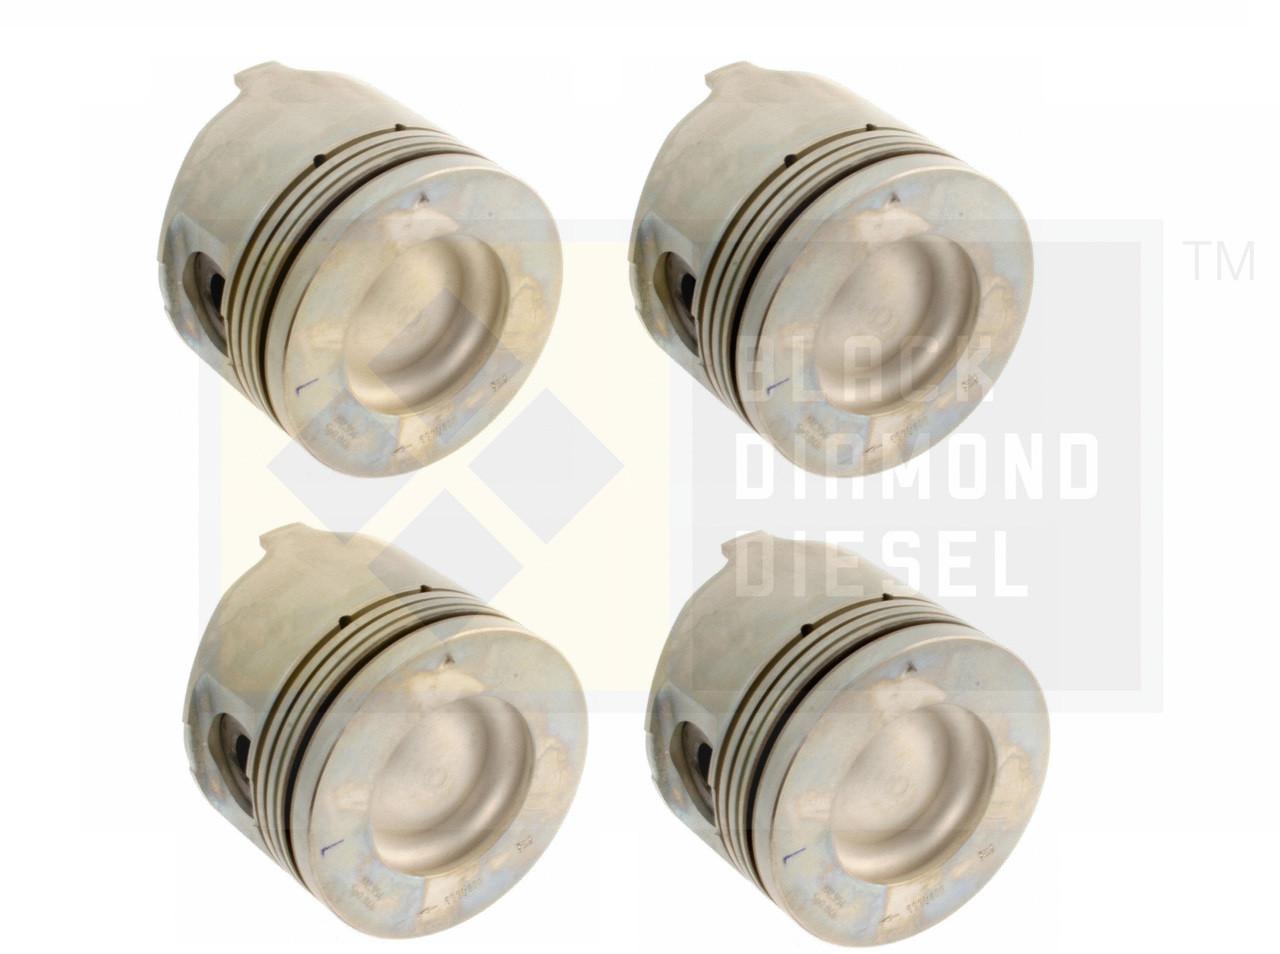 Black Diamond 07.5-10 Duramax 6.6 LMM .020 Oversize Left Side Pistons (4)